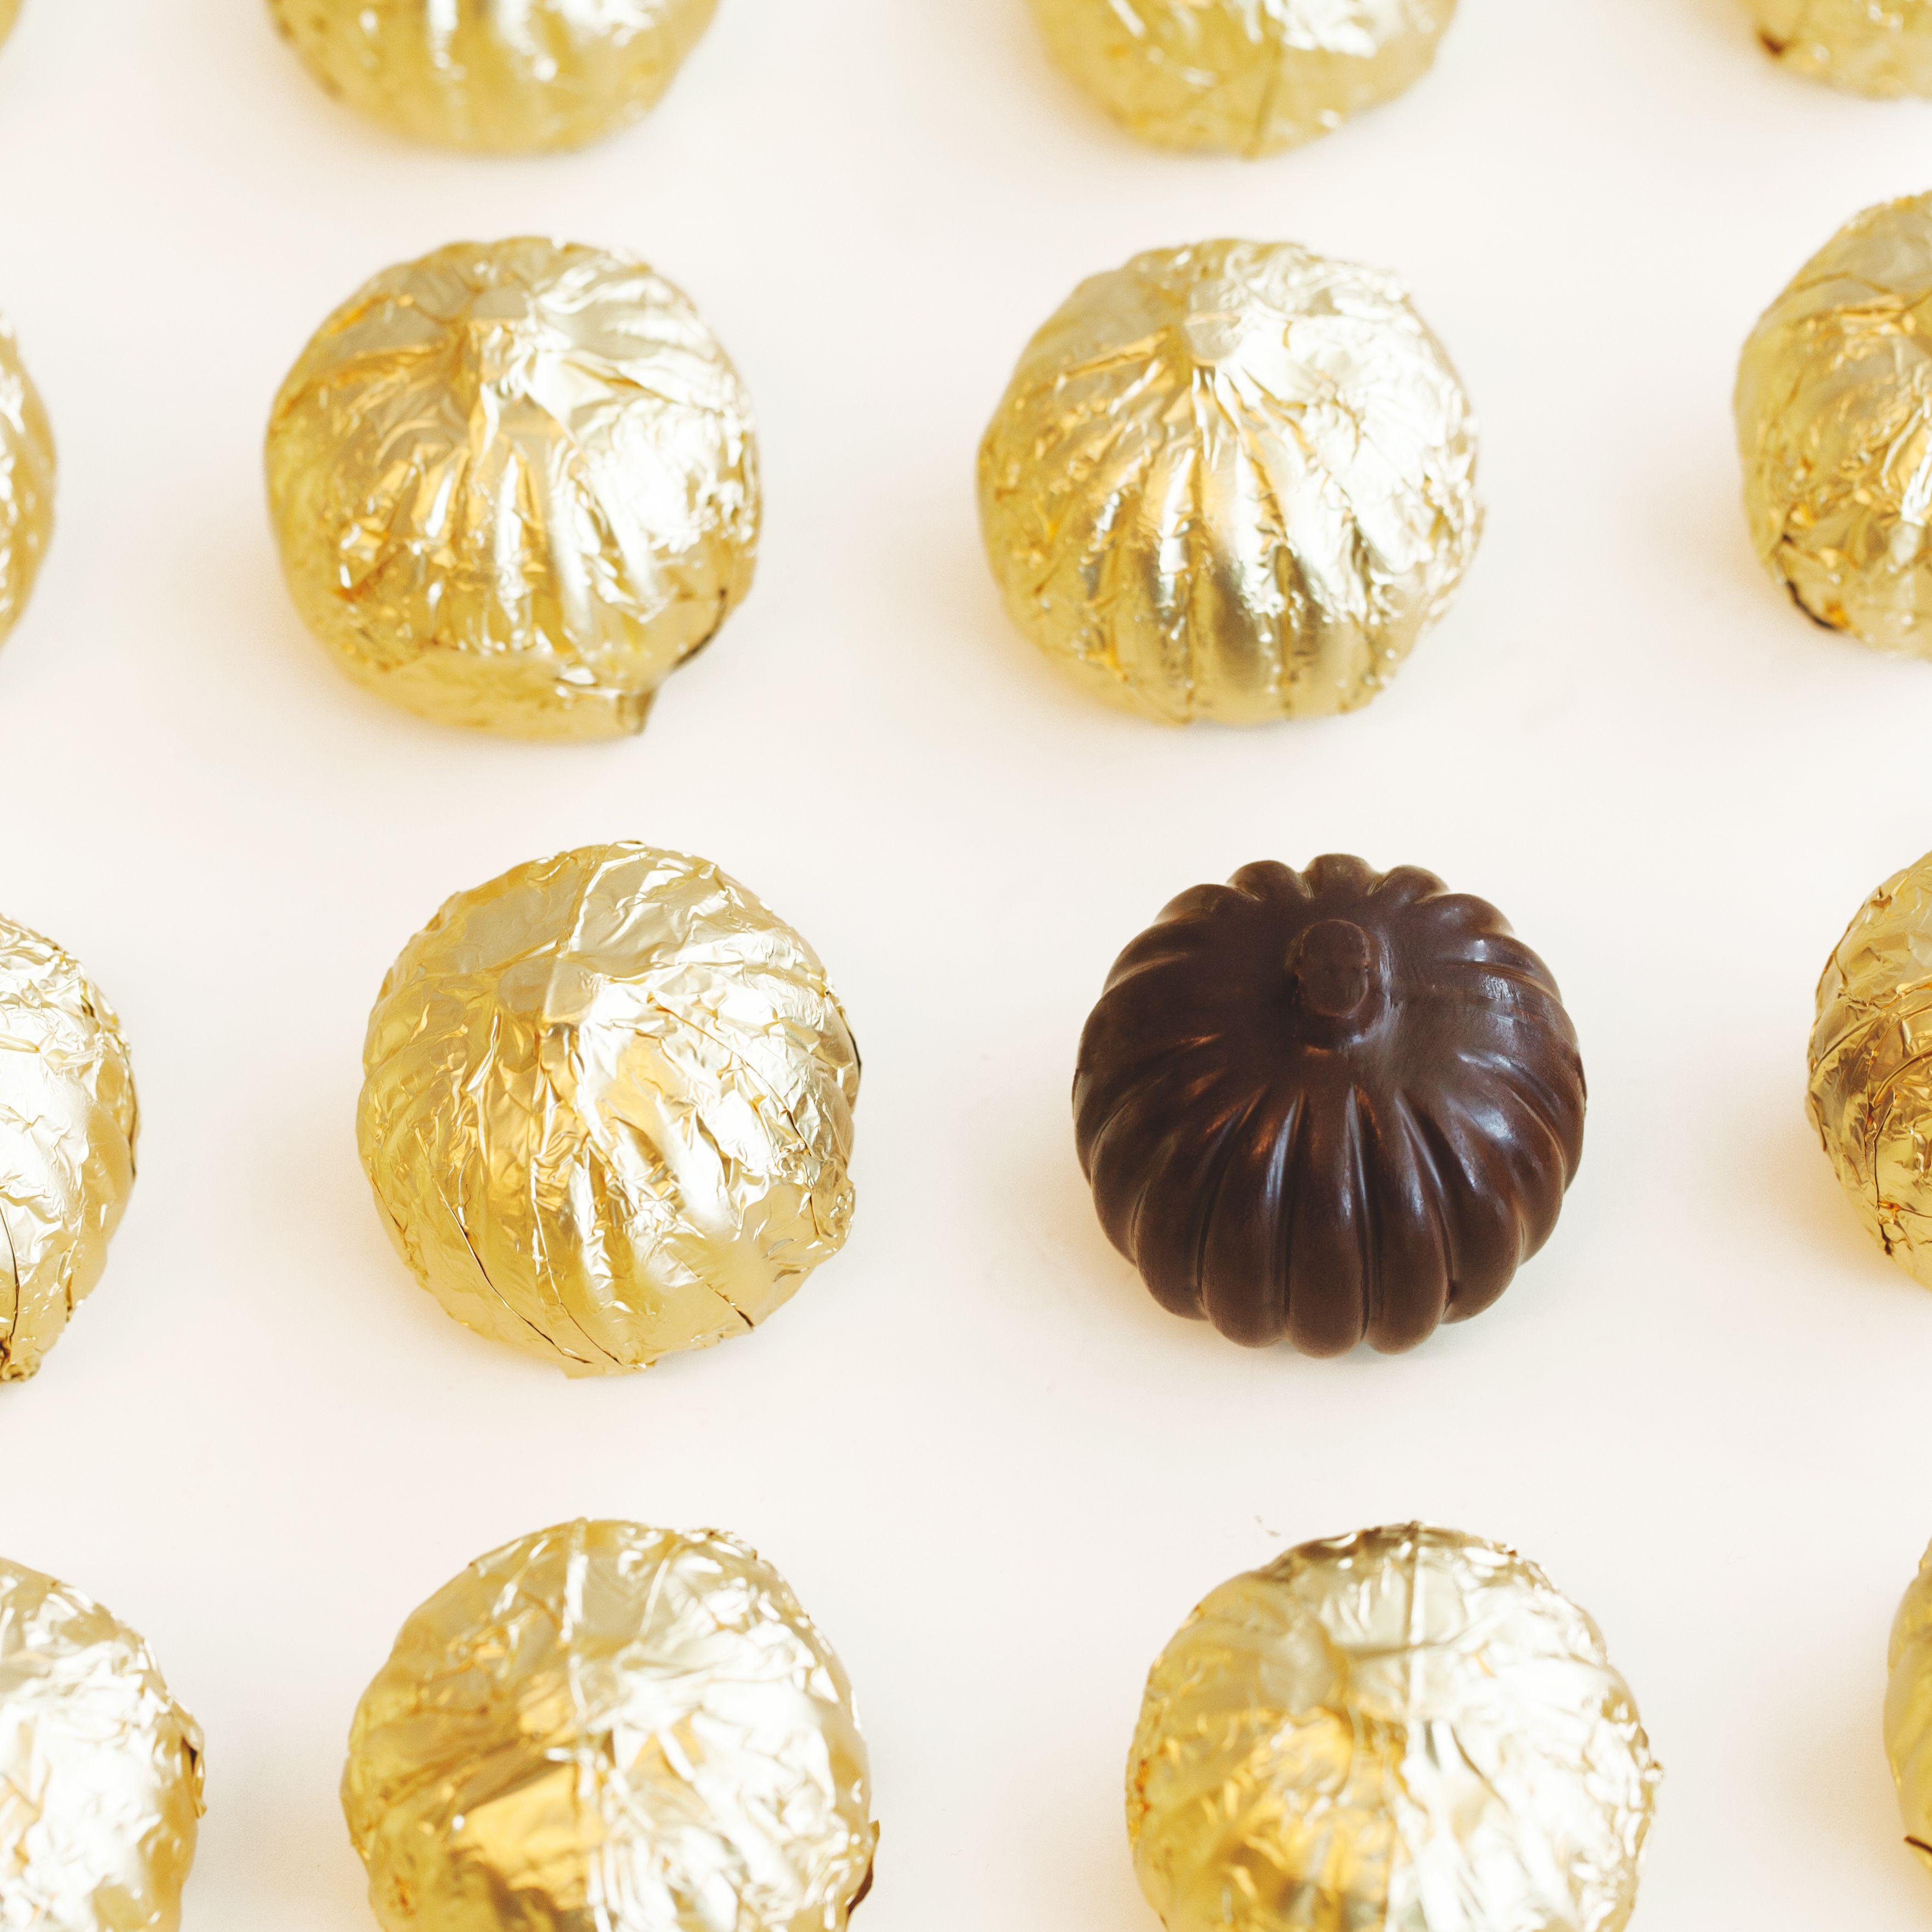 Pretty pumpkins for fall! Enjoy Purdys chocolate pumpkins this fall.